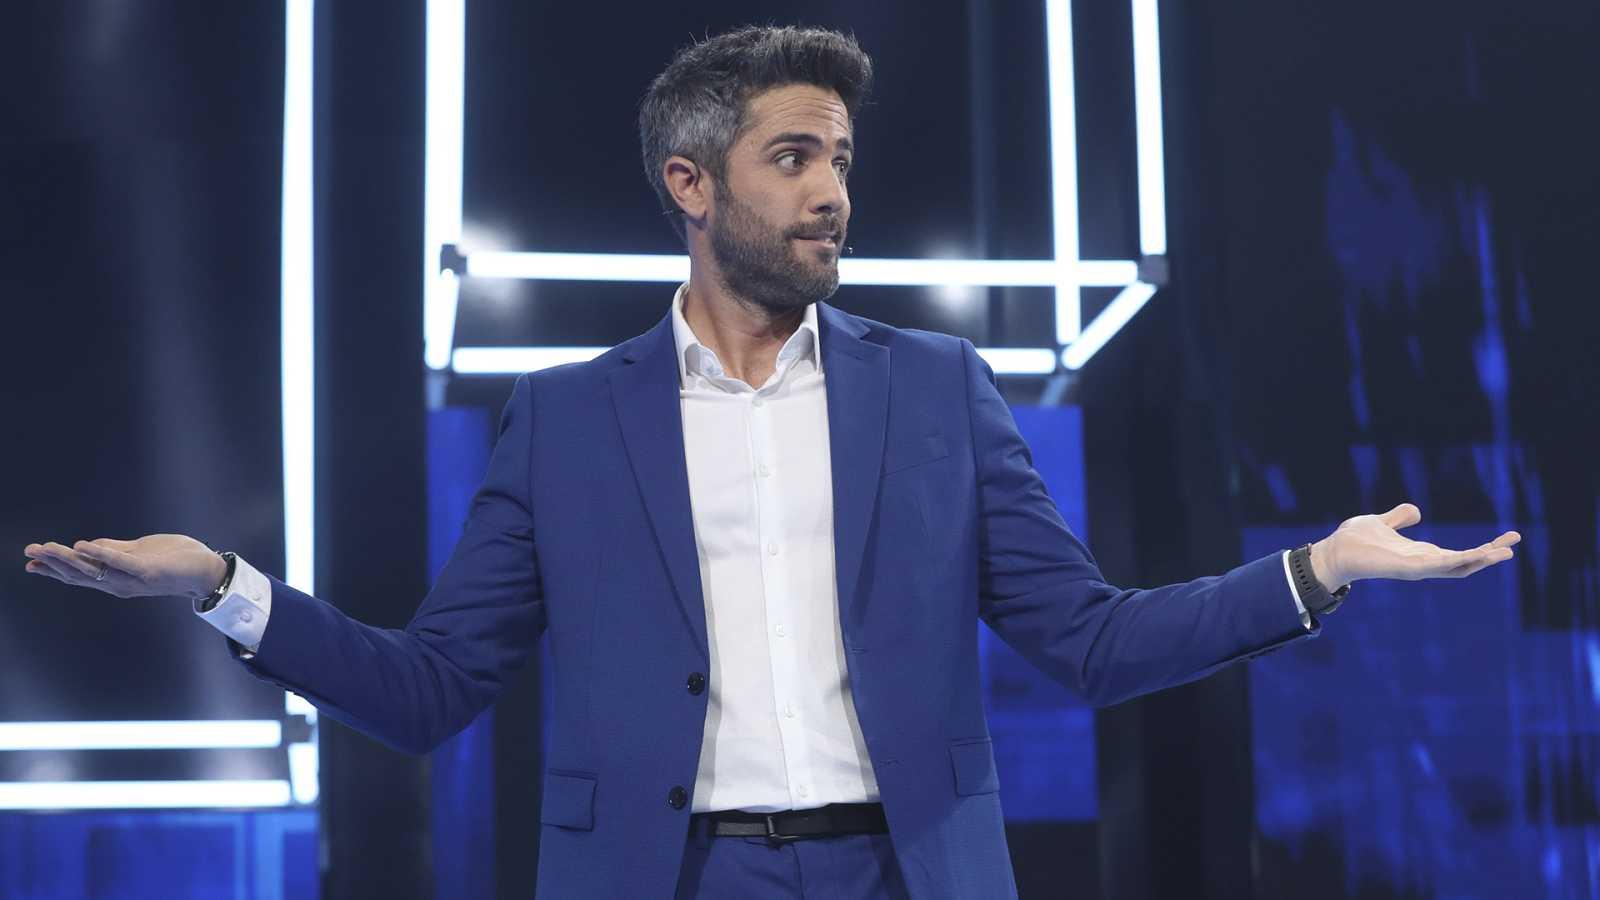 Mejores momentos de Roberto Leal, presentador de OT 2020